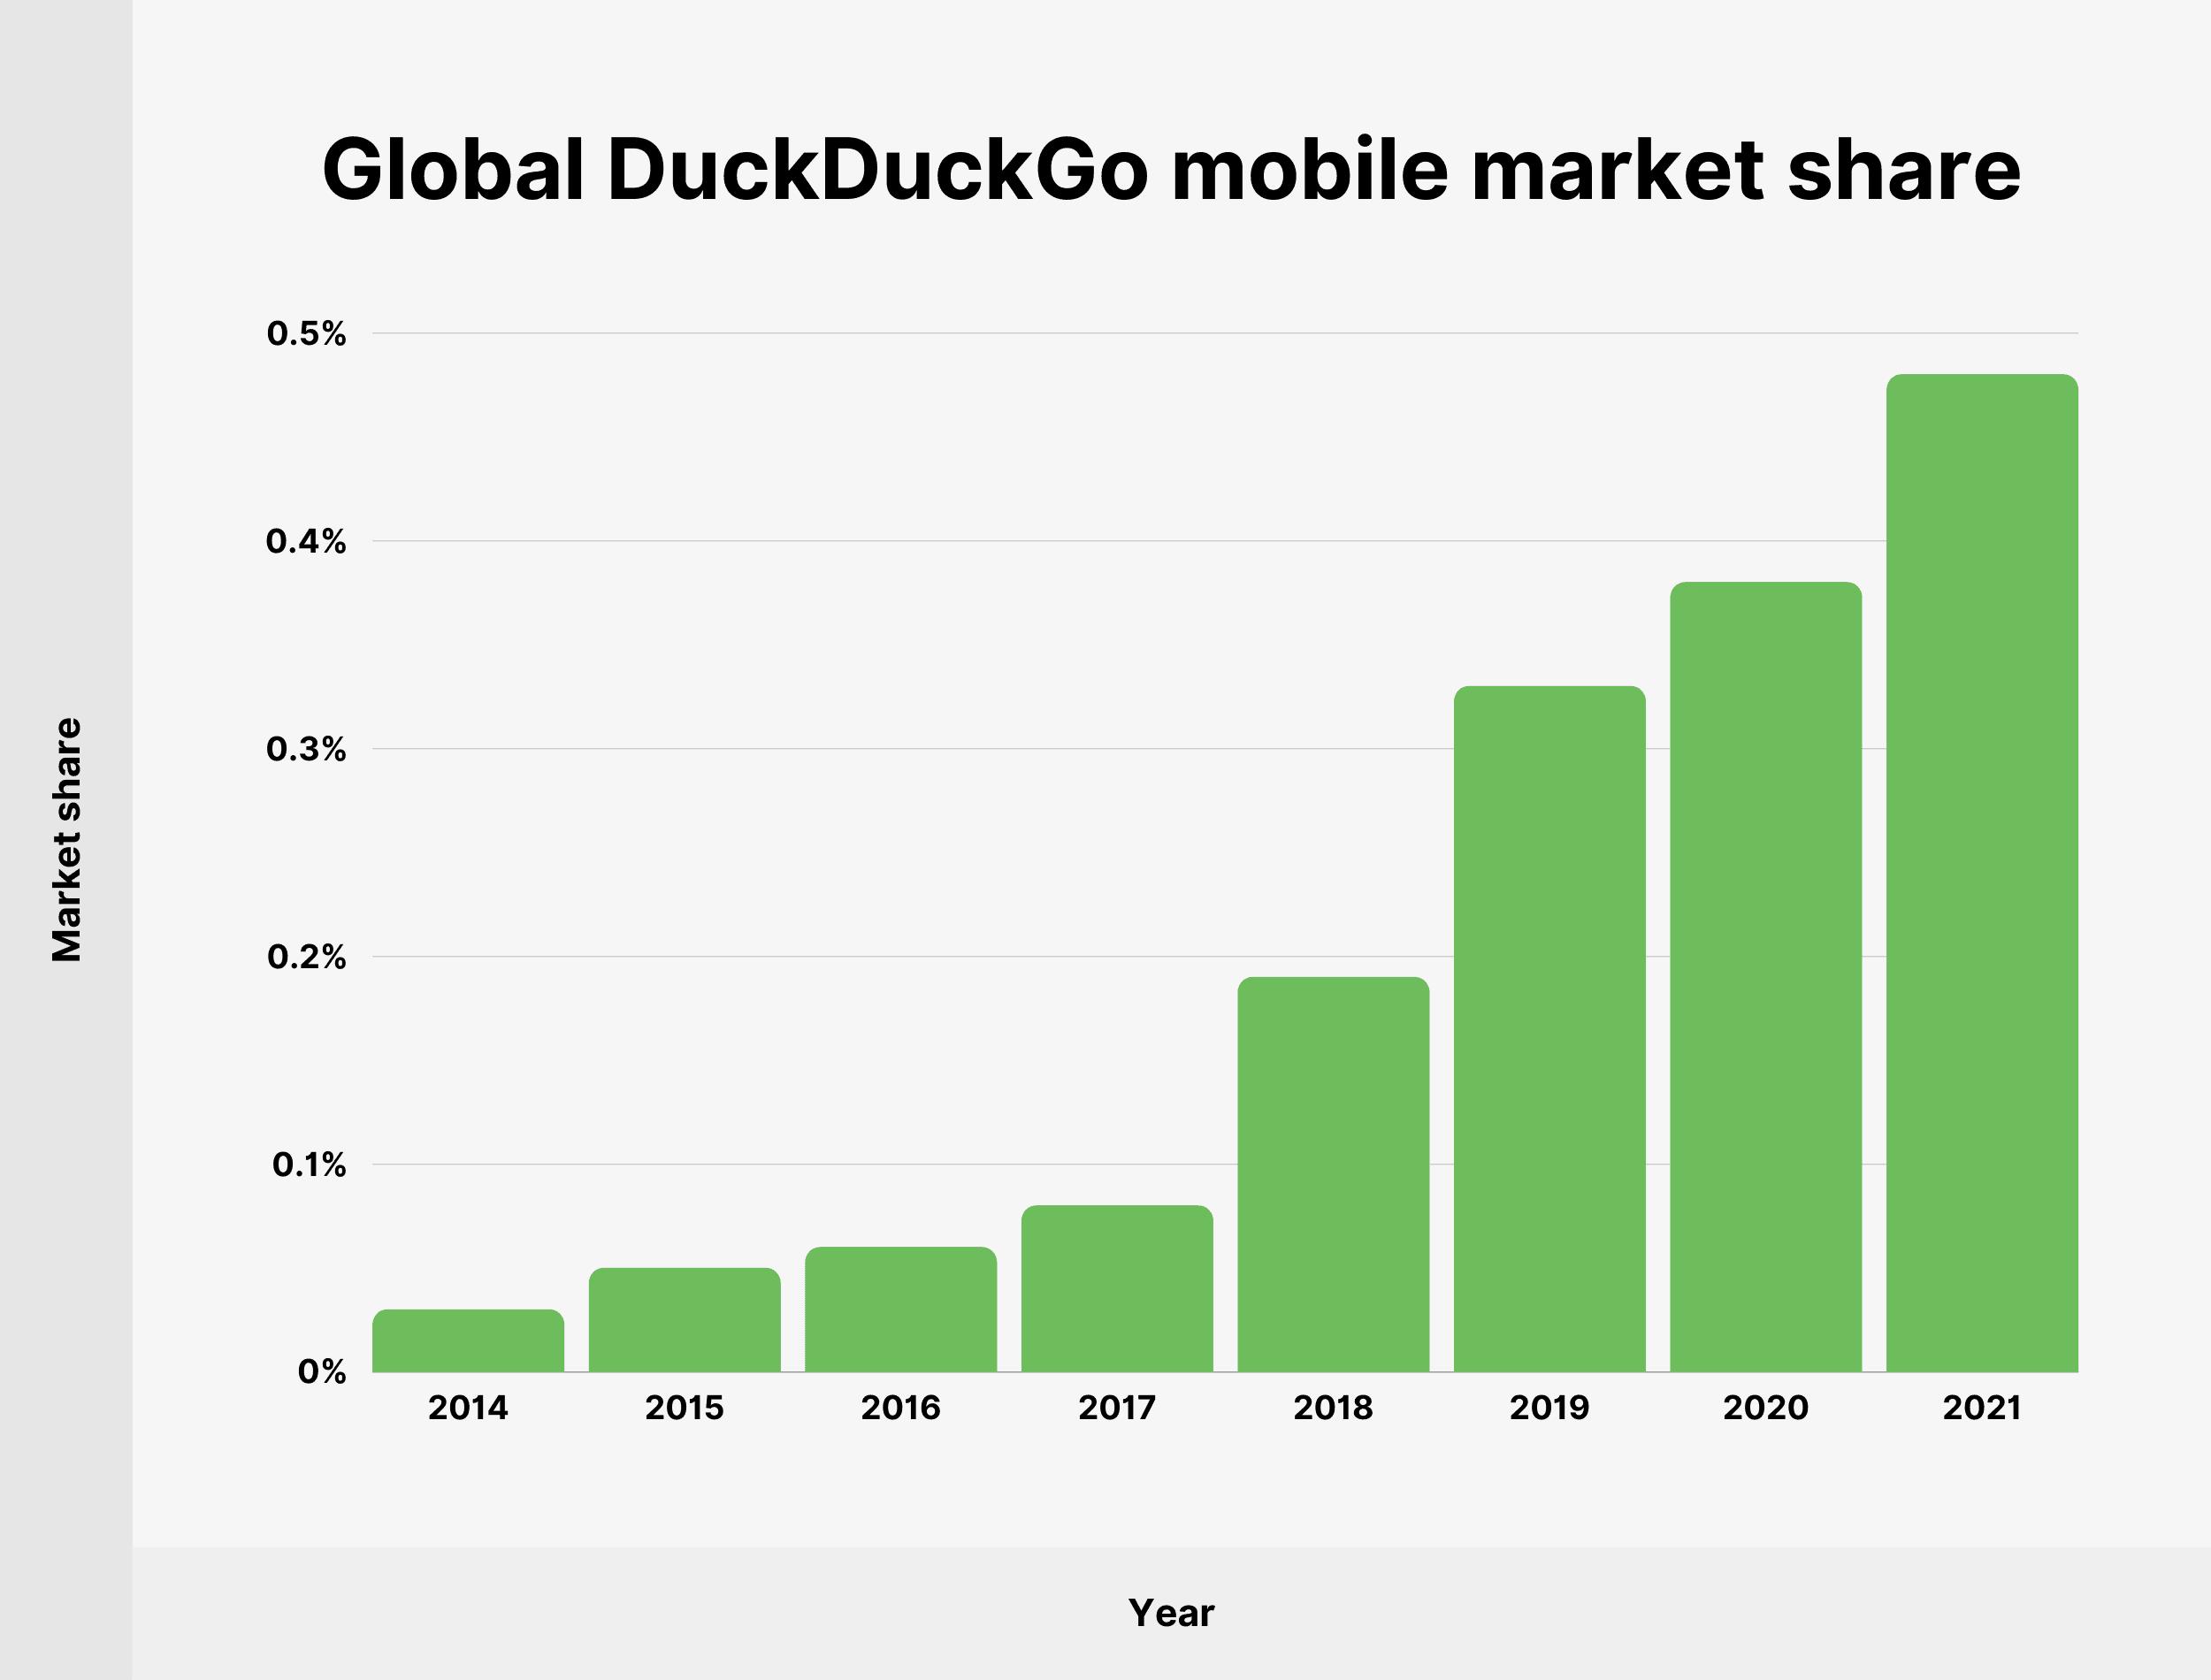 Global DuckDuckGo mobile market share